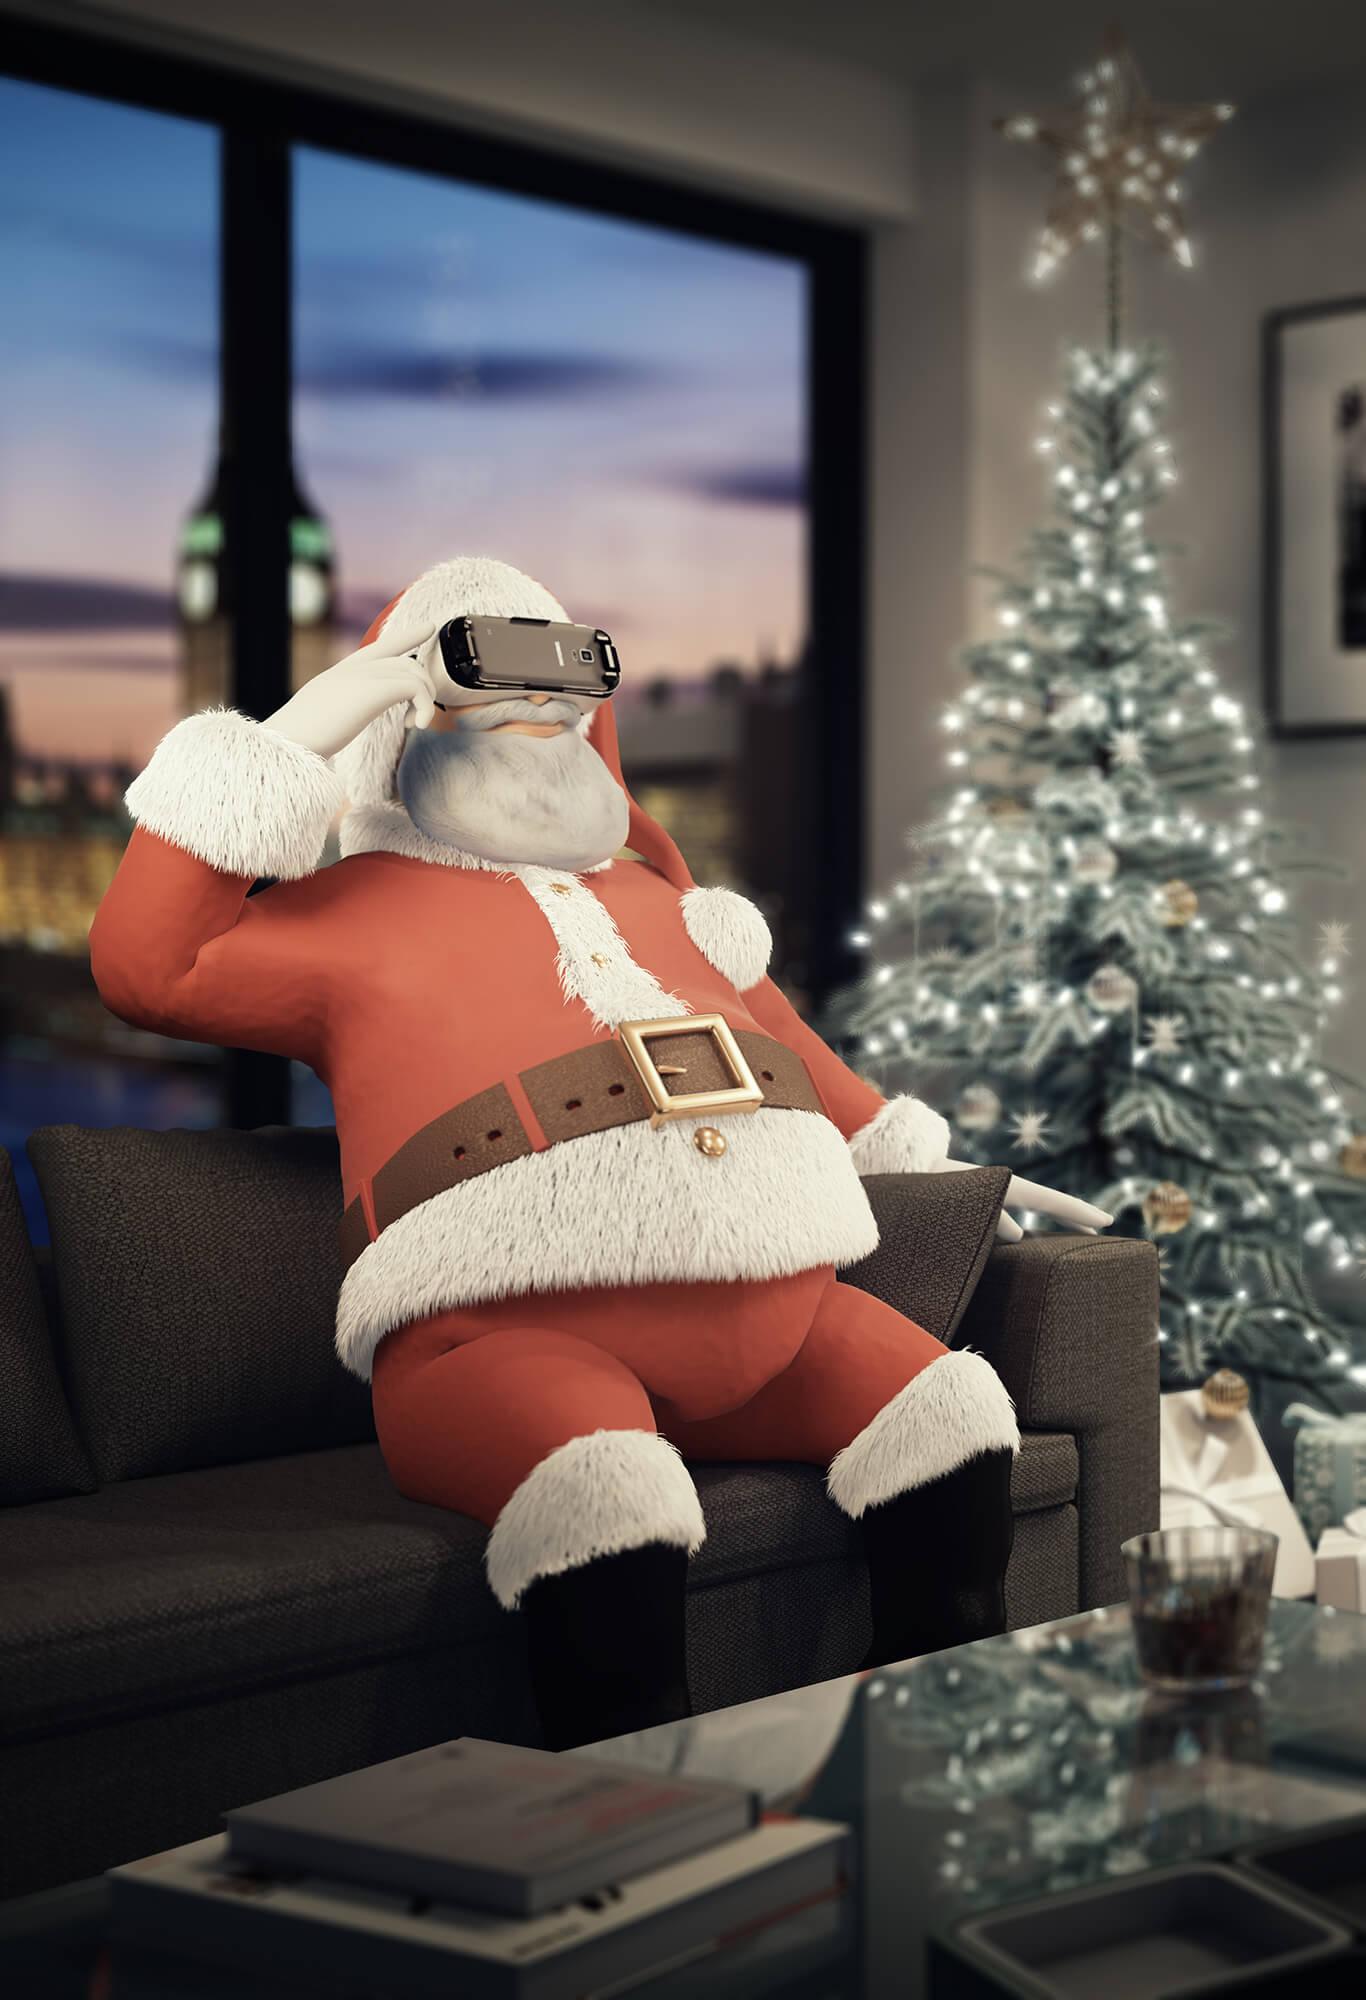 White Crow Studios - Santa wearing VR Headset